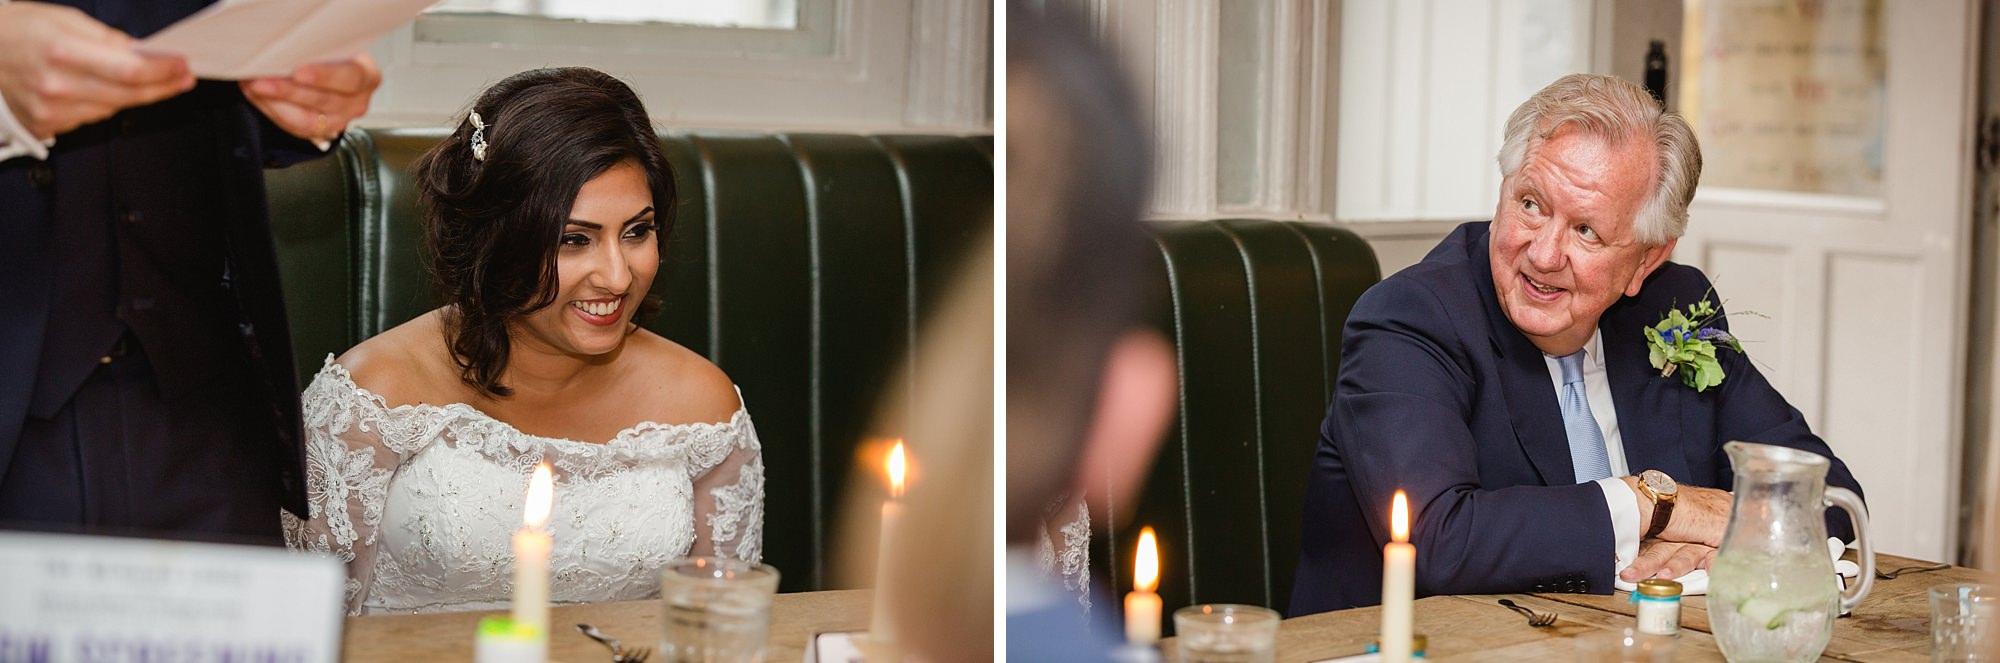 Paradise by way of Kensal Green wedding bride during wedding speech